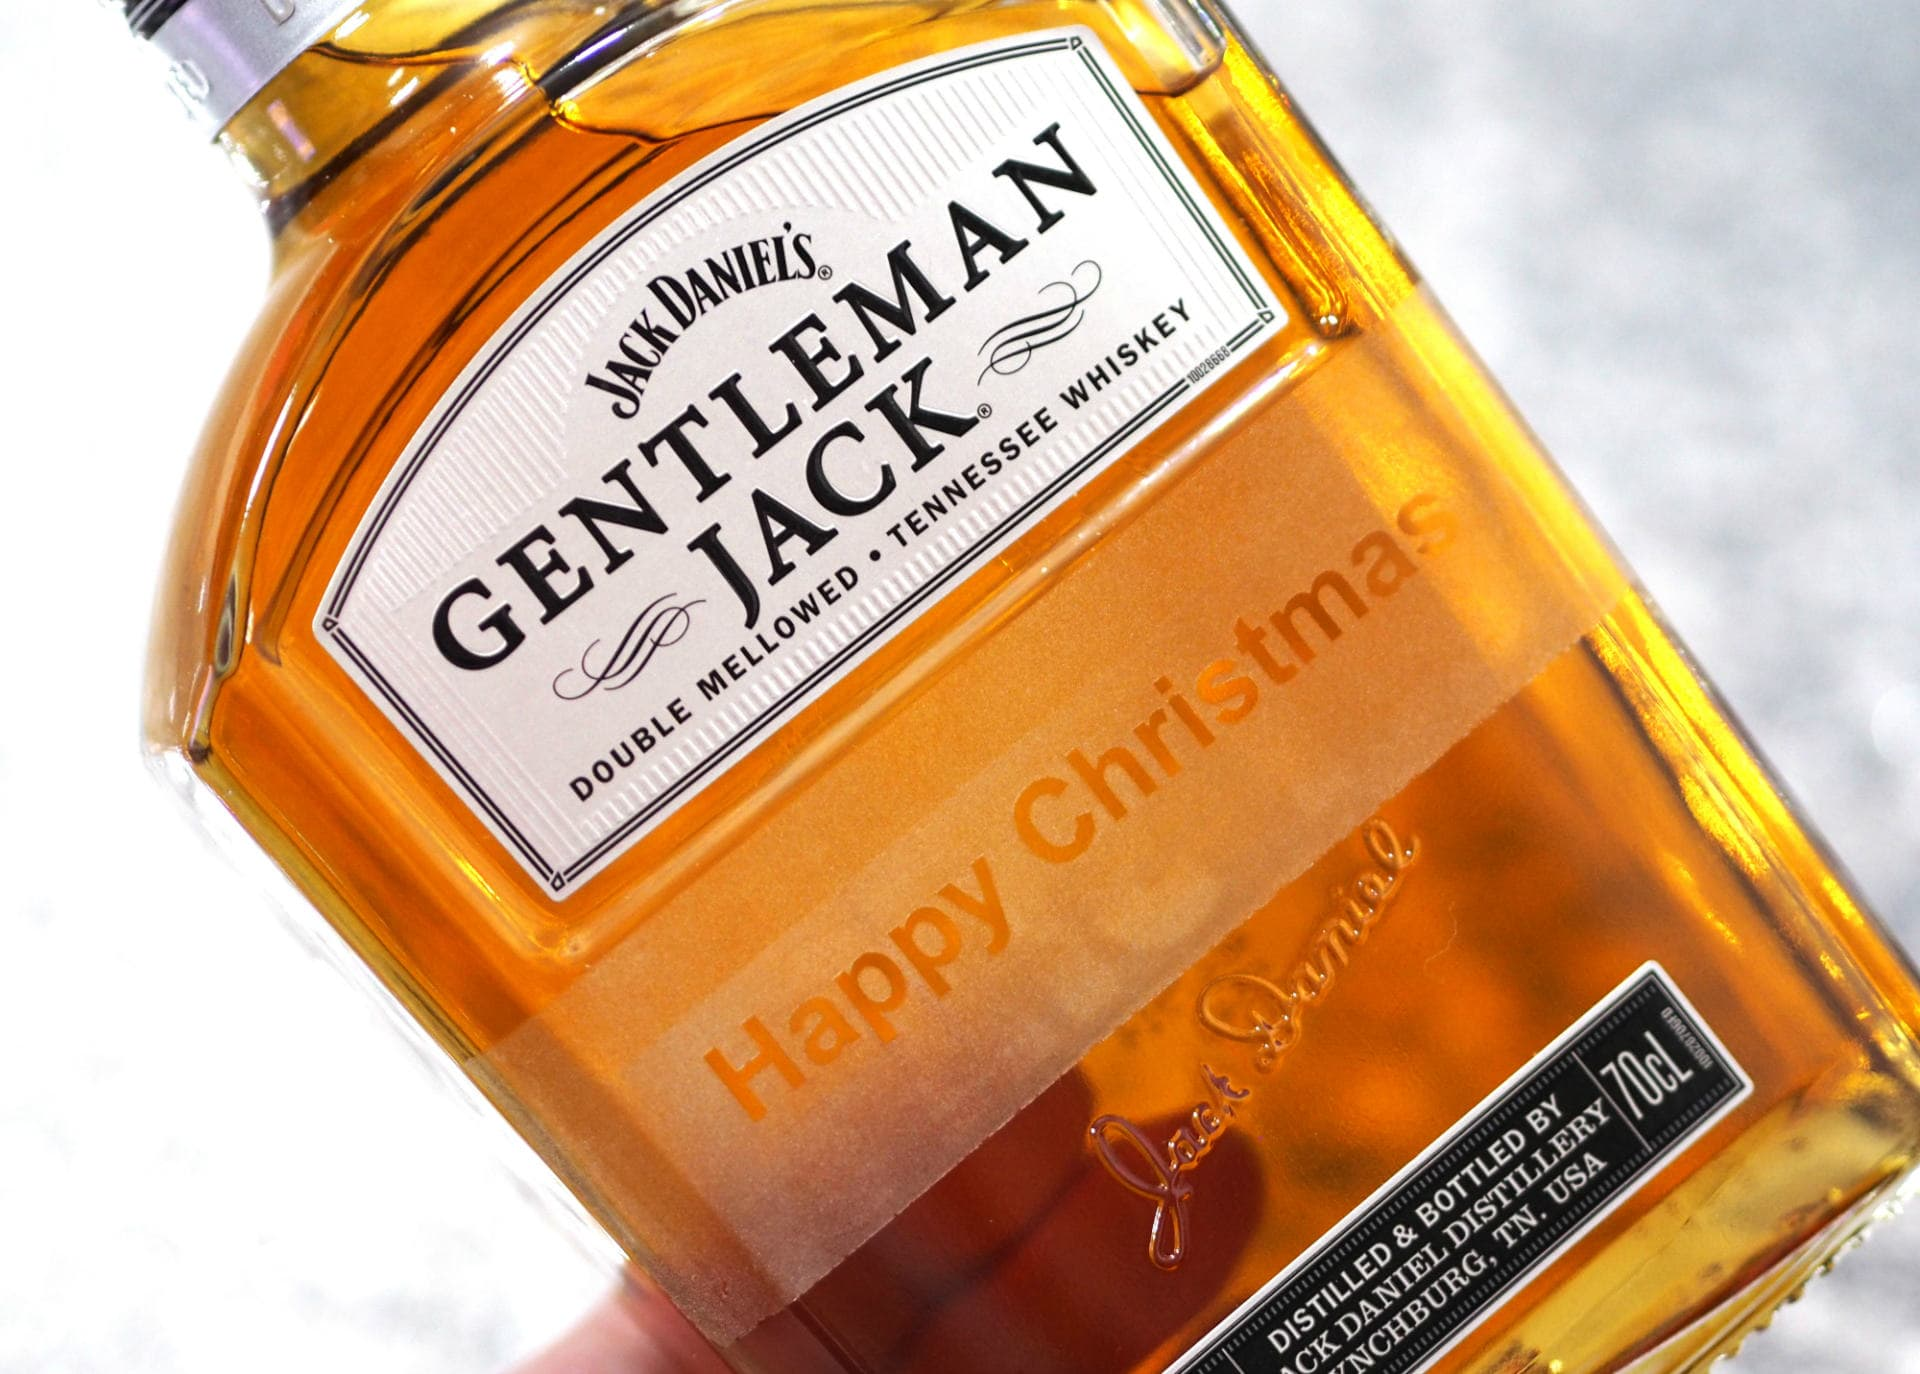 Jack Daniel's Gentleman Jack Double Mellowed Tennessee Whiskey